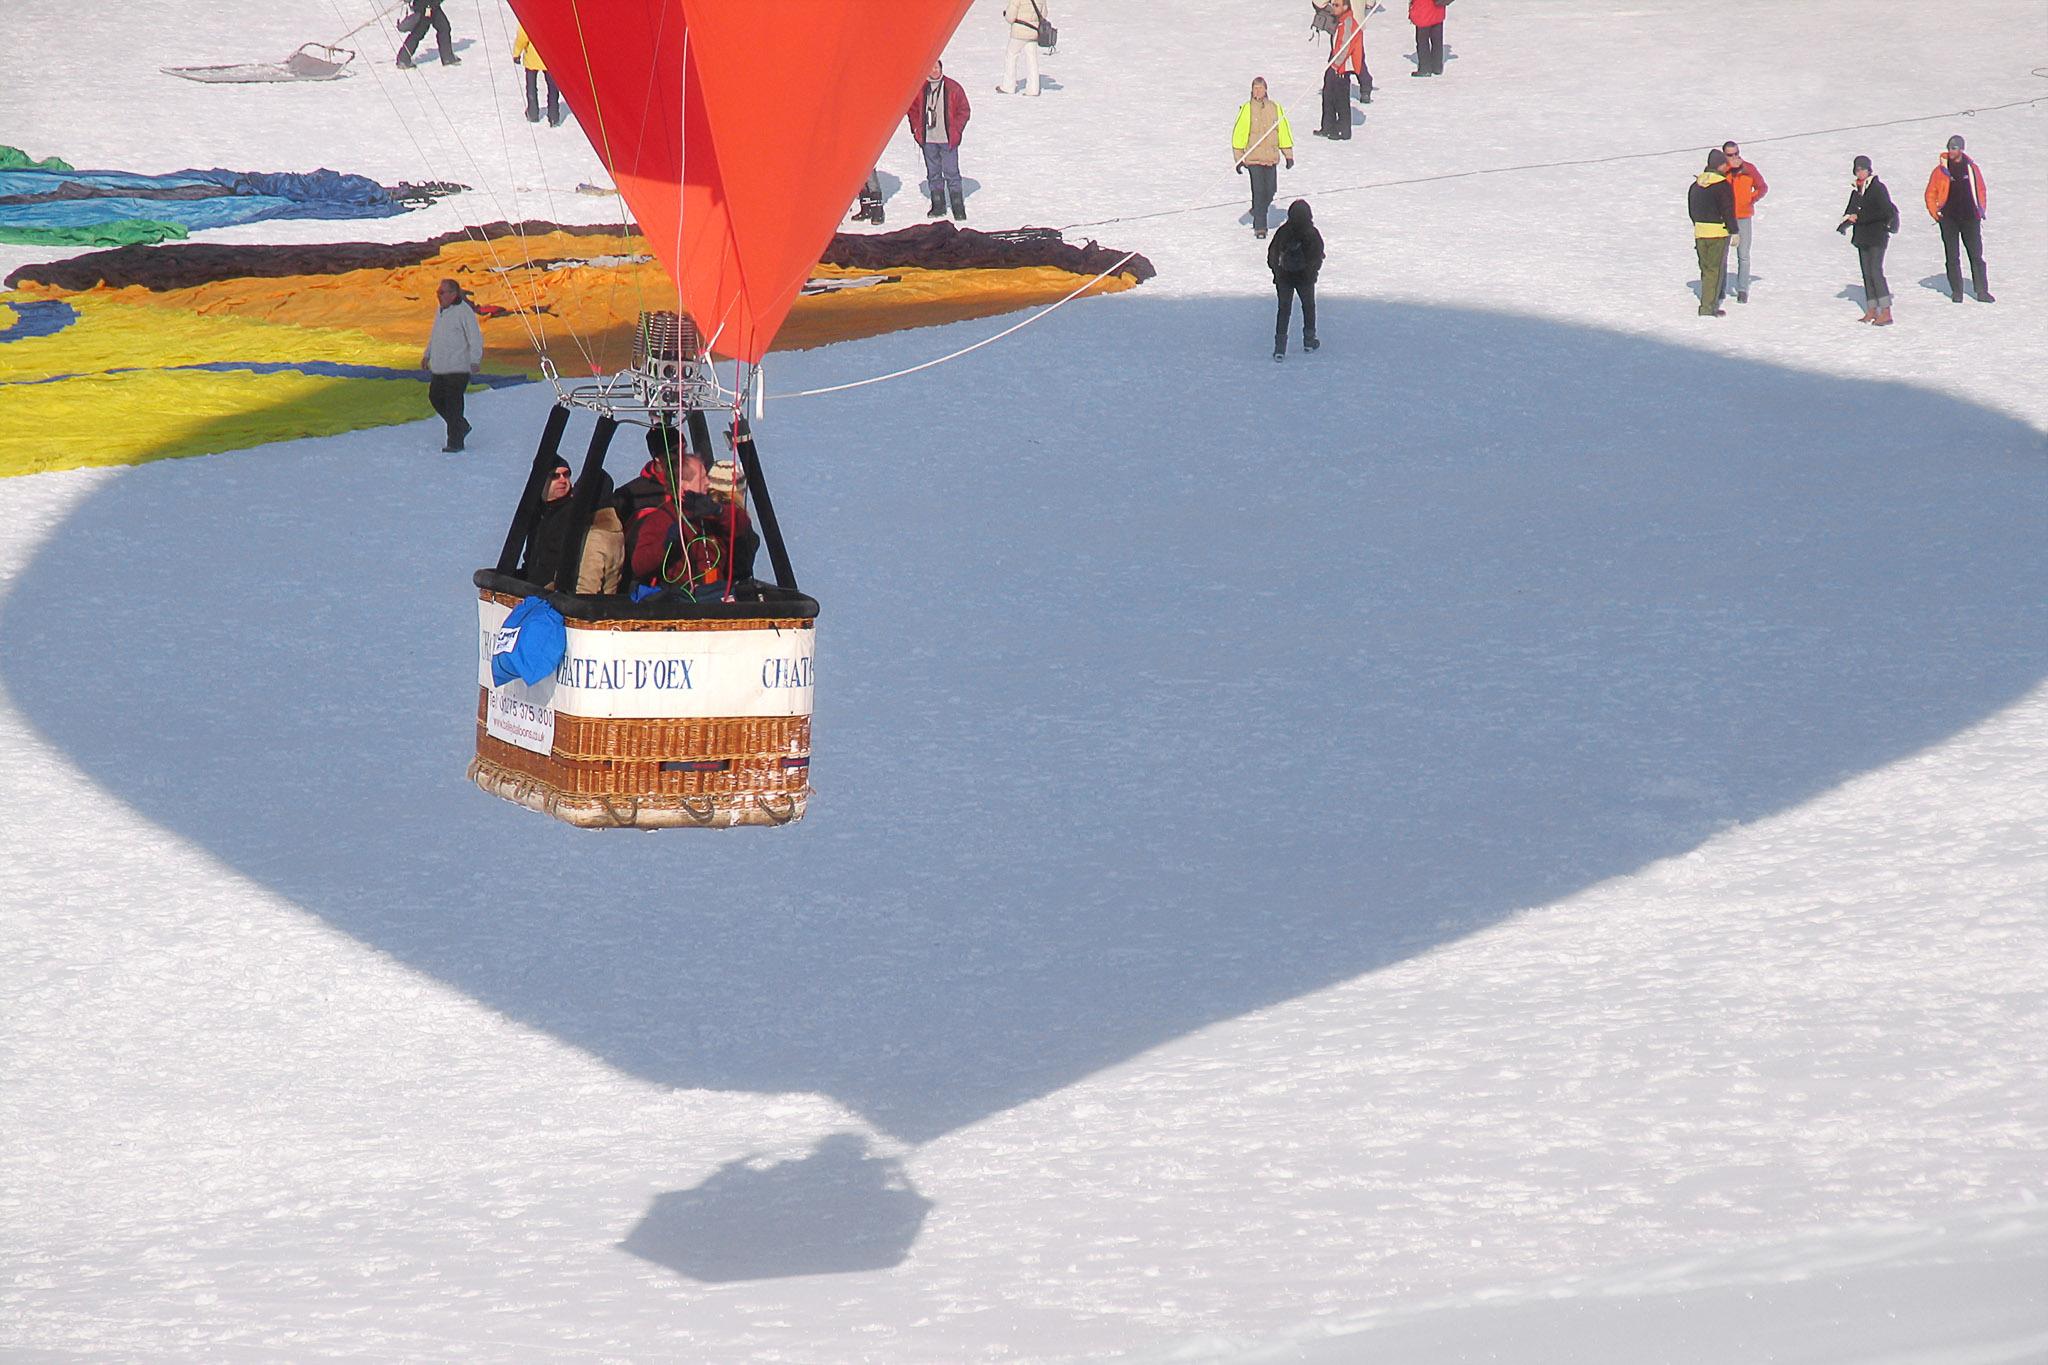 Hot Air Balloon Festival - Château-d'Oex, Switzerland